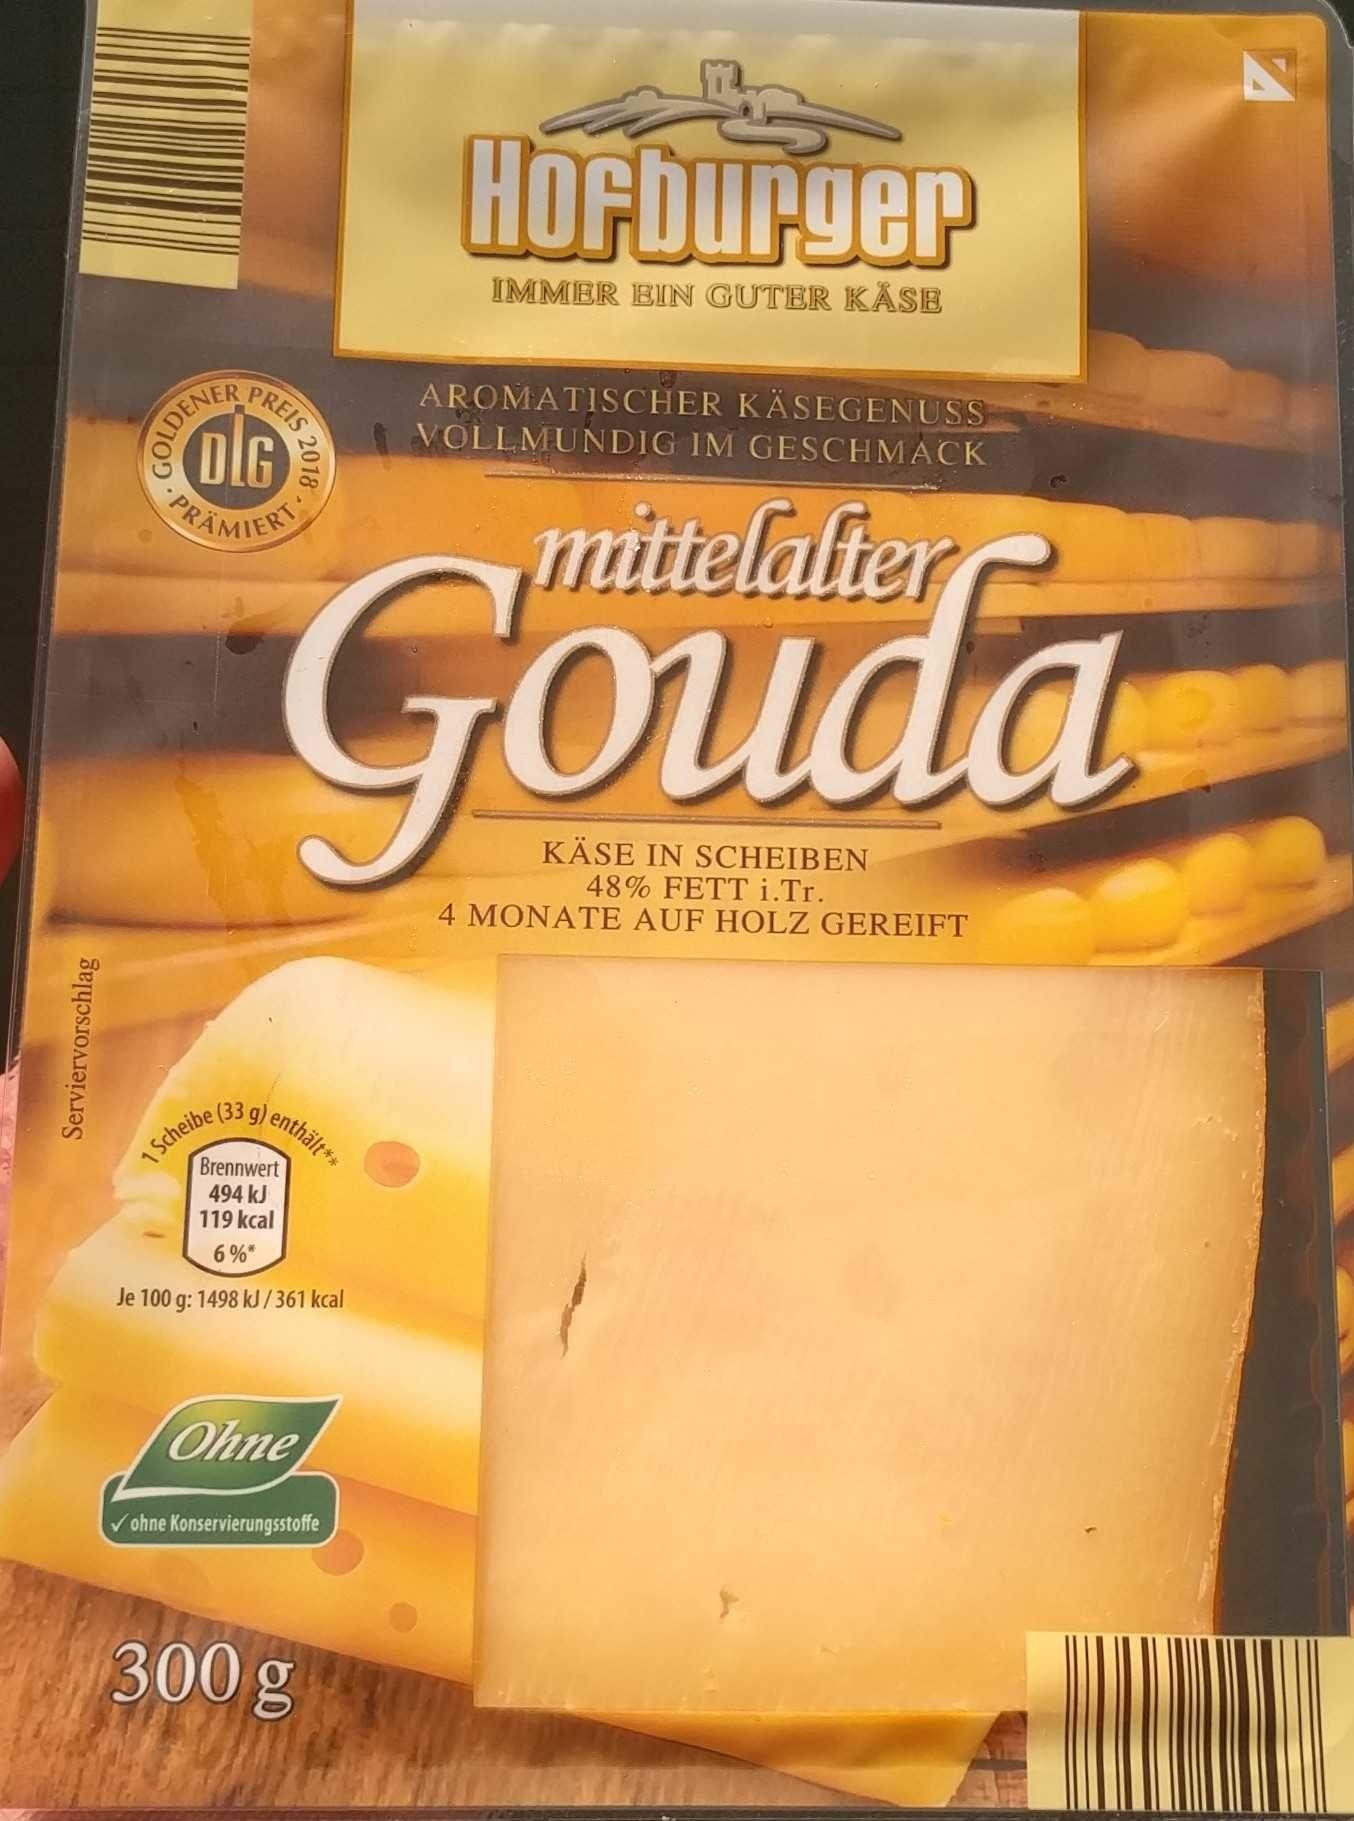 Mittelalter Gouda - Product